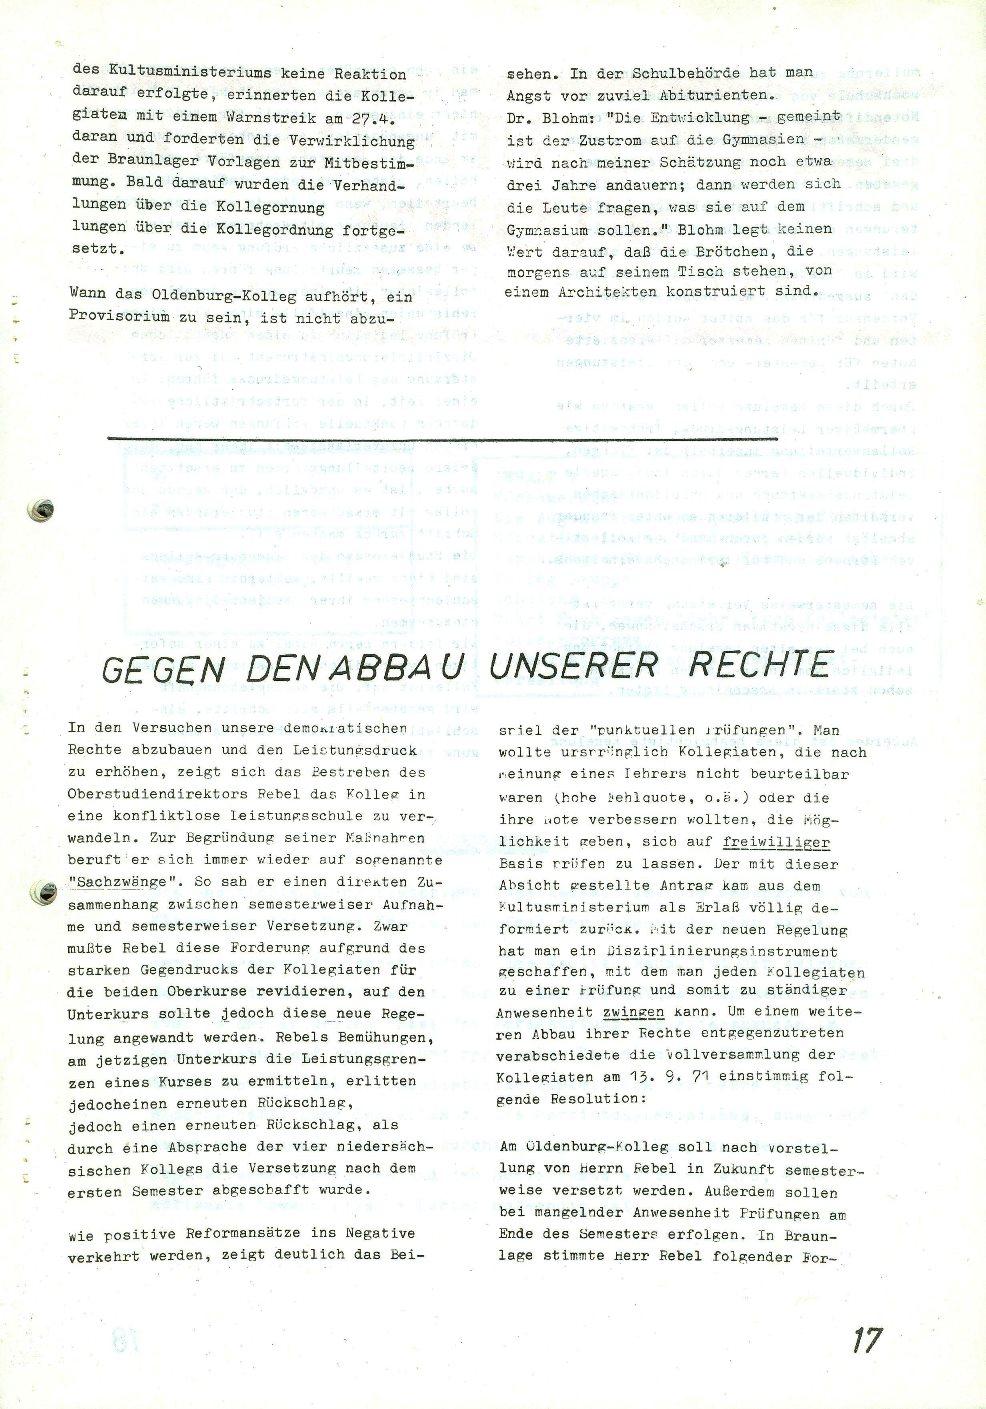 Oldenburg_KBW071